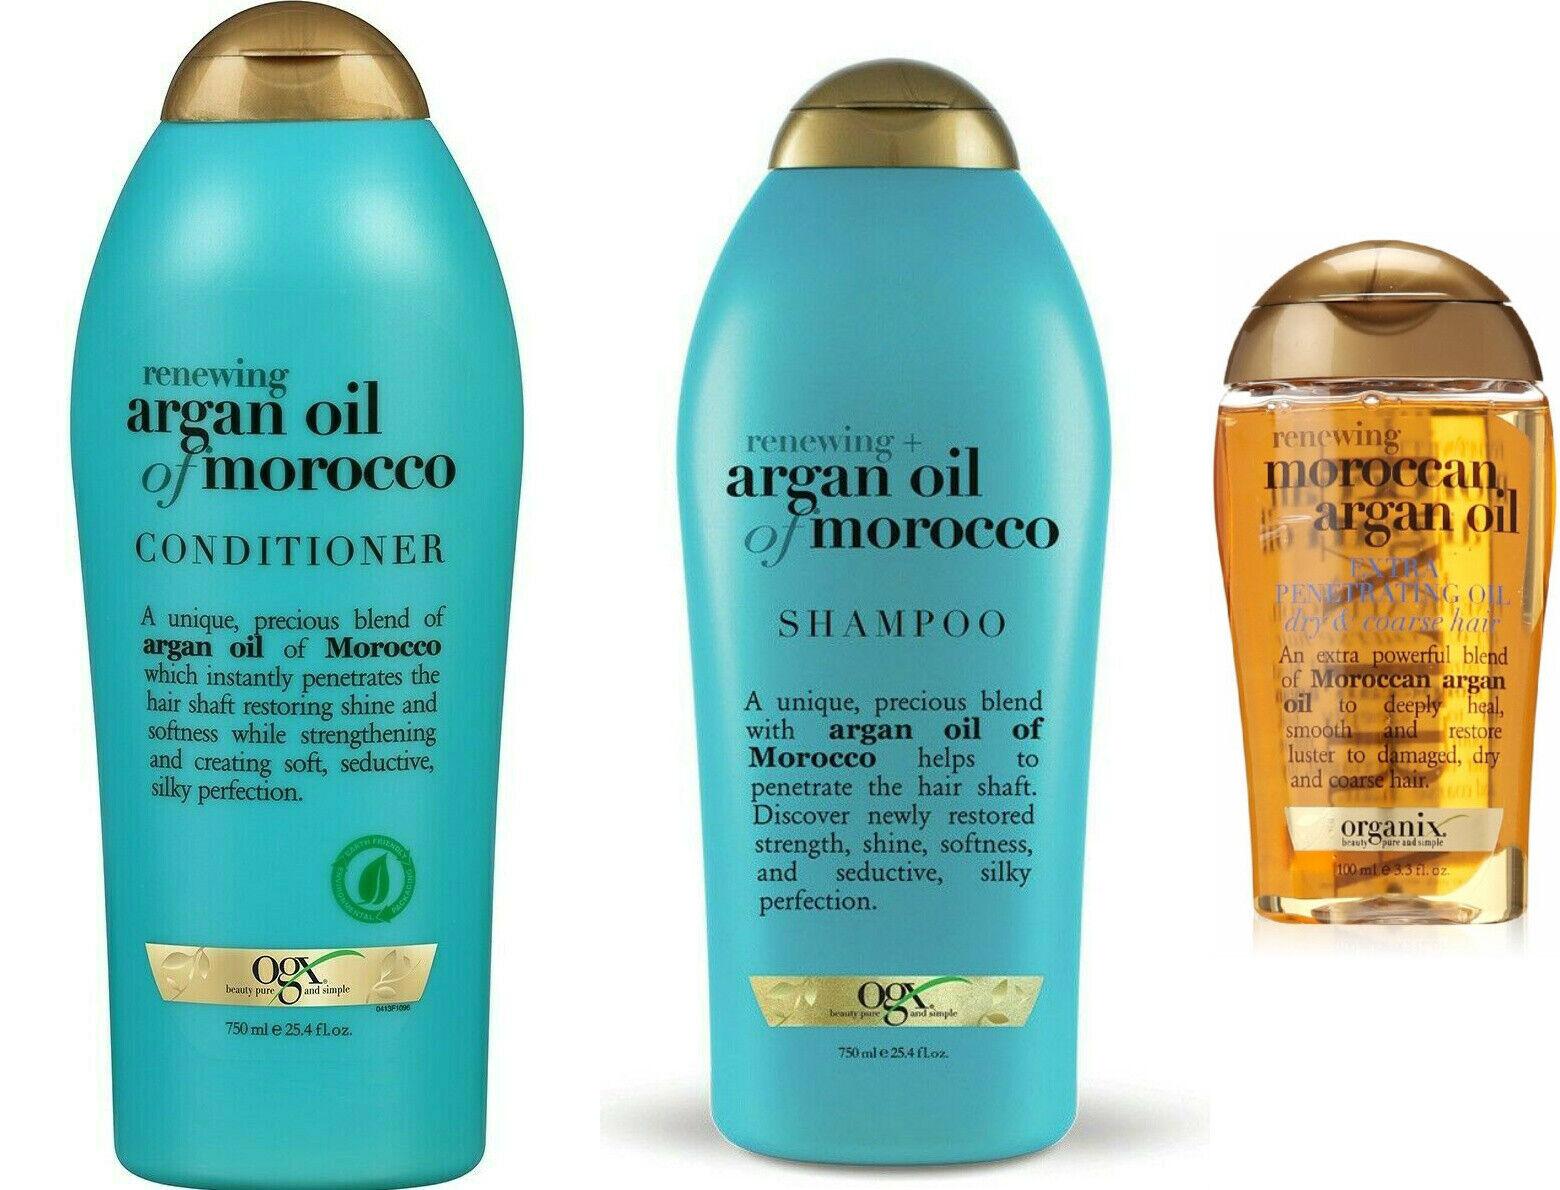 OGX Renewing Argan Oil of Morocco Shampoo & Conditioner 25.4